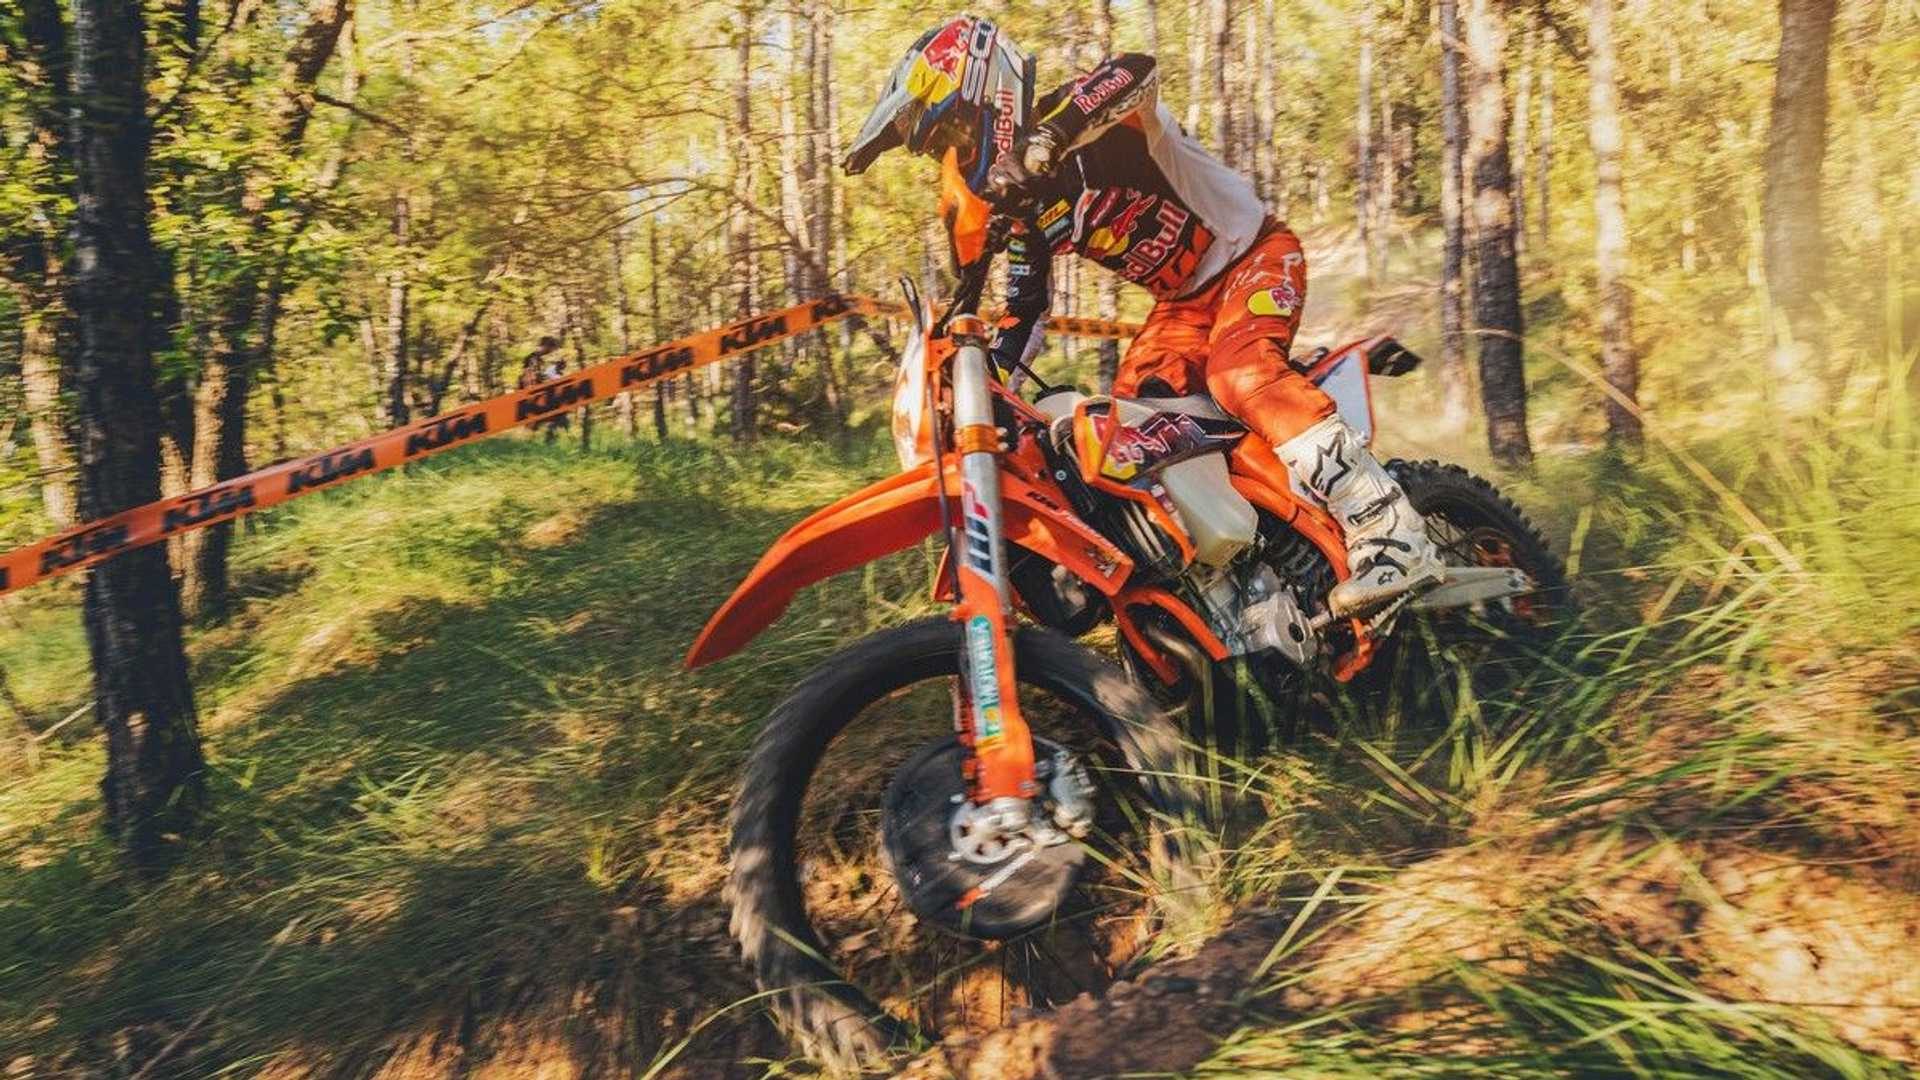 2022 KTM 350 EXC-F Factory Edition - Trail